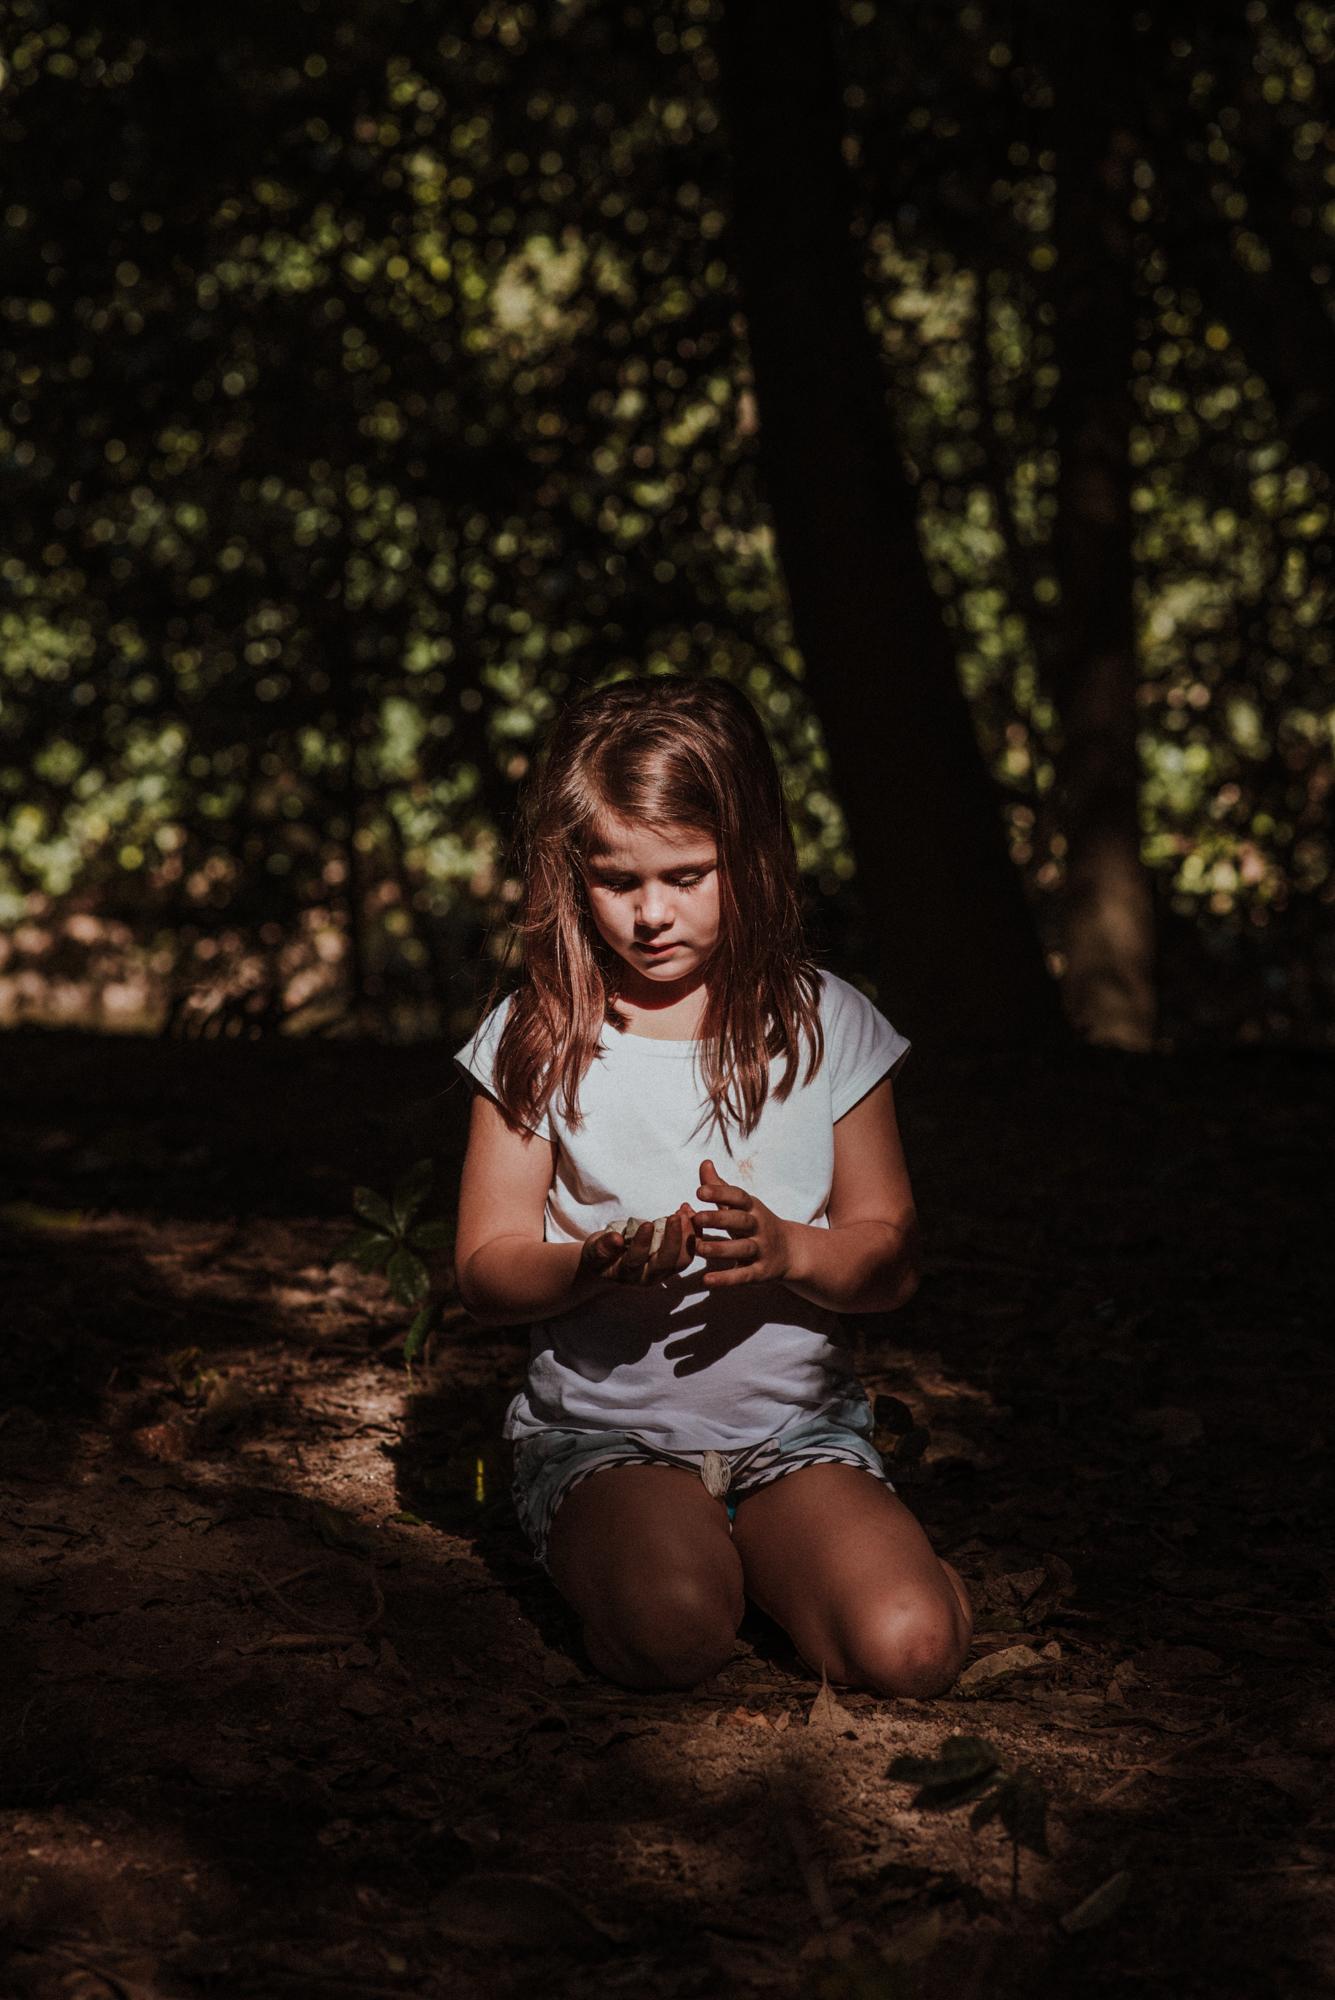 jessica-howard-photography-greenwoods-web-13.jpg